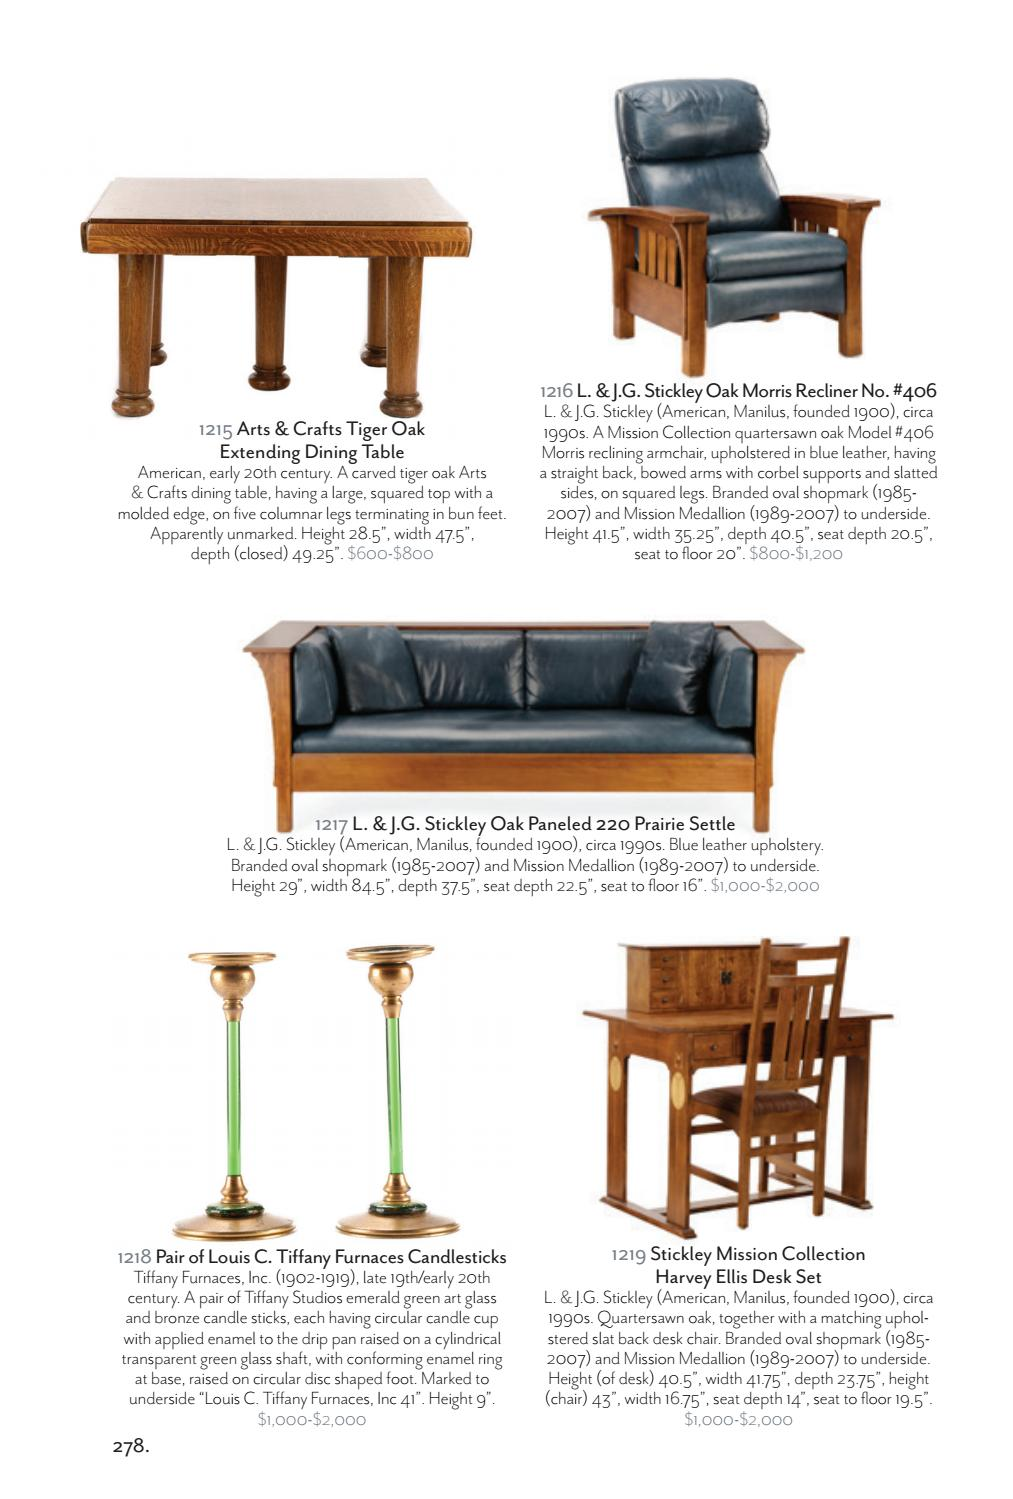 Fabulous Ahlers Ogletree January 2017 Auction Catalog New Years Lamtechconsult Wood Chair Design Ideas Lamtechconsultcom